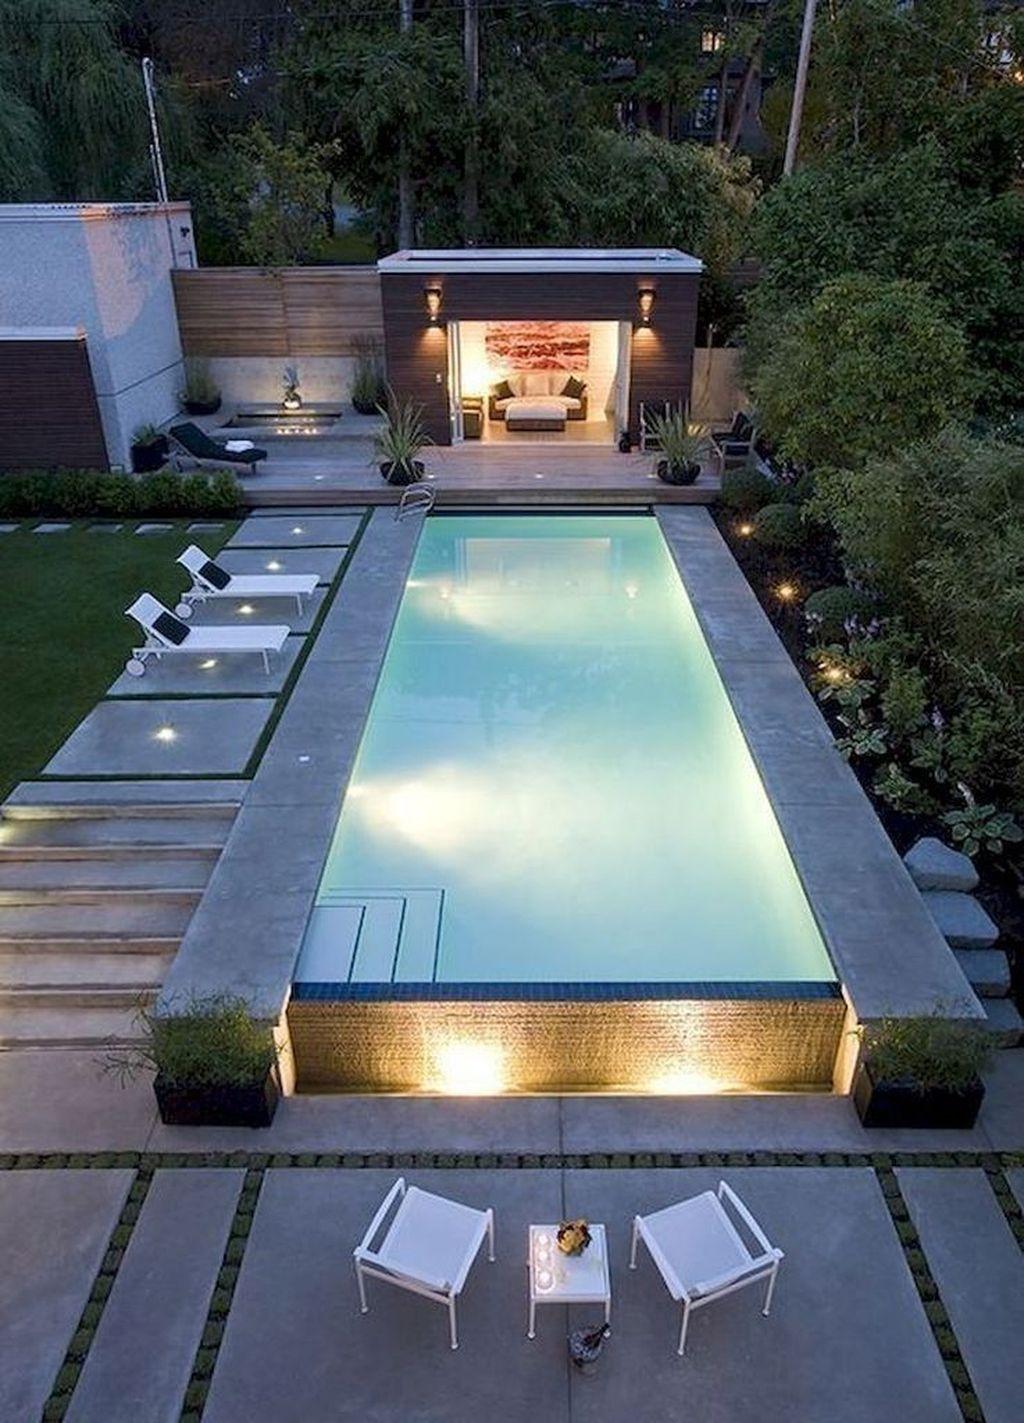 20 Extraordinary Small Pool Design Ideas For Small Backyard Backyard Pool Designs Swimming Pools Backyard Backyard Pool